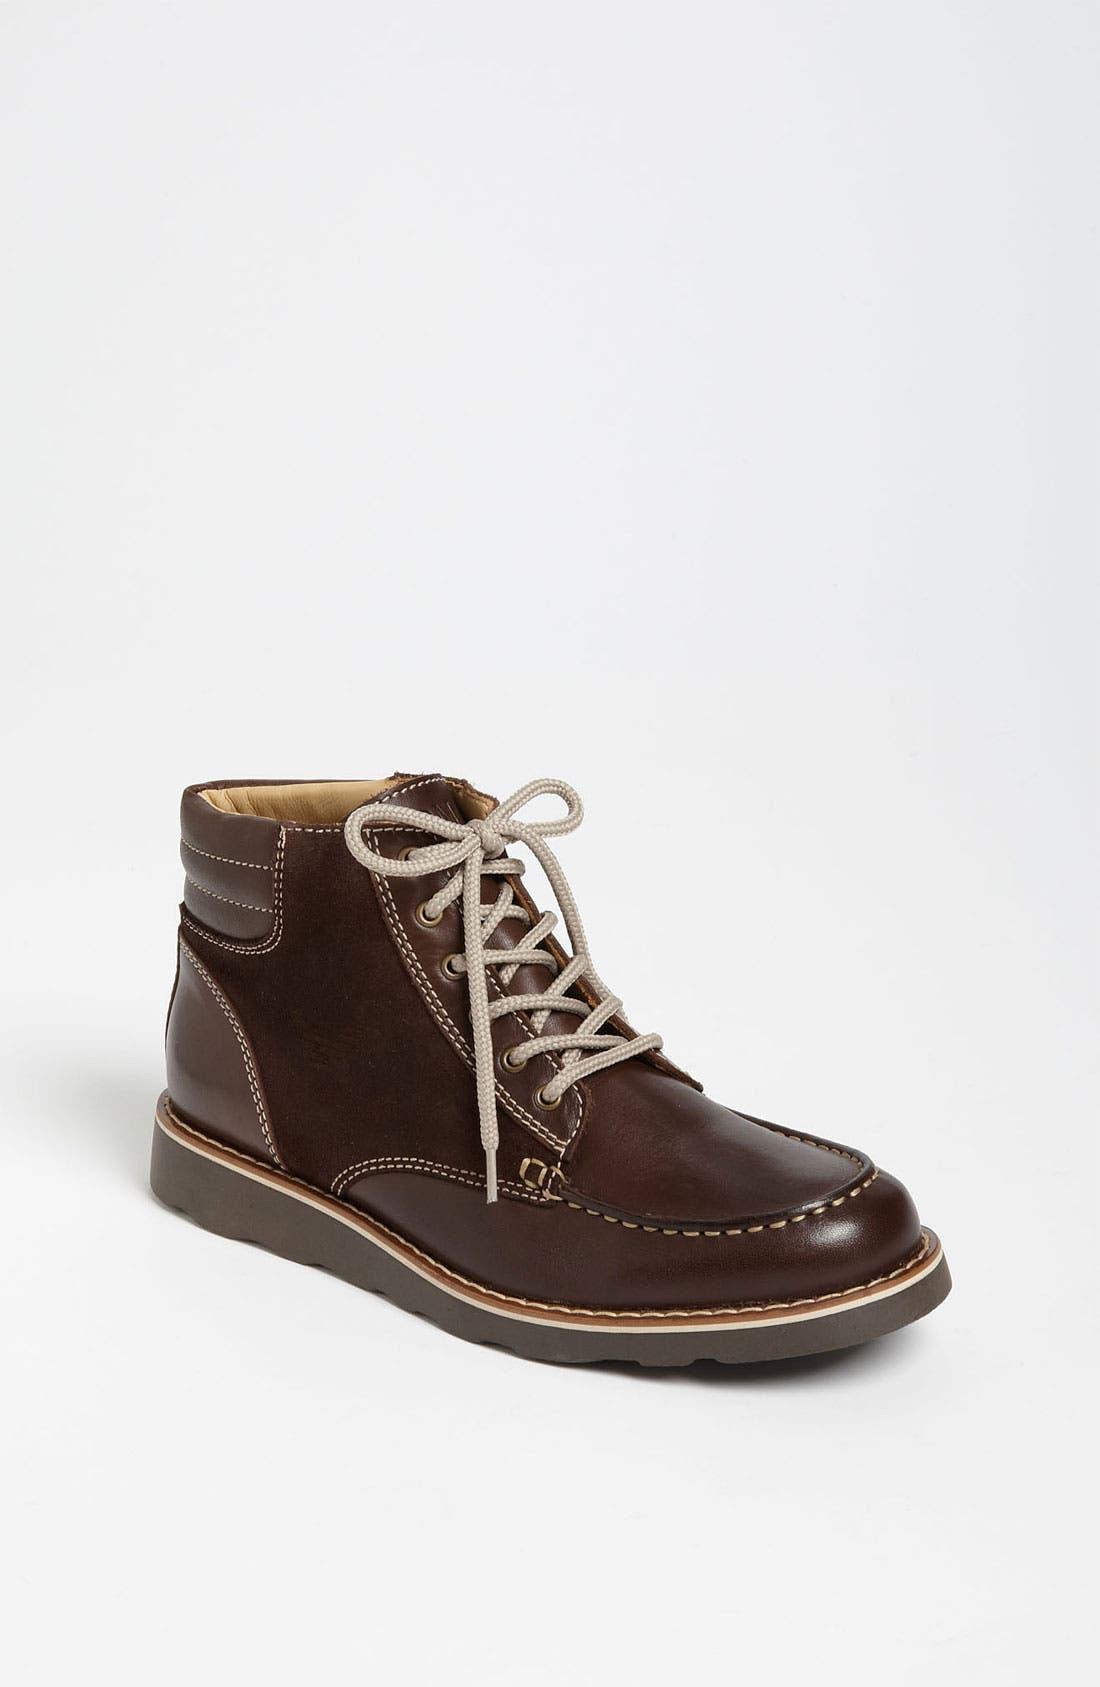 Main Image - Armani Junior Leather Boot (Toddler, Little Kid & Big Kid)